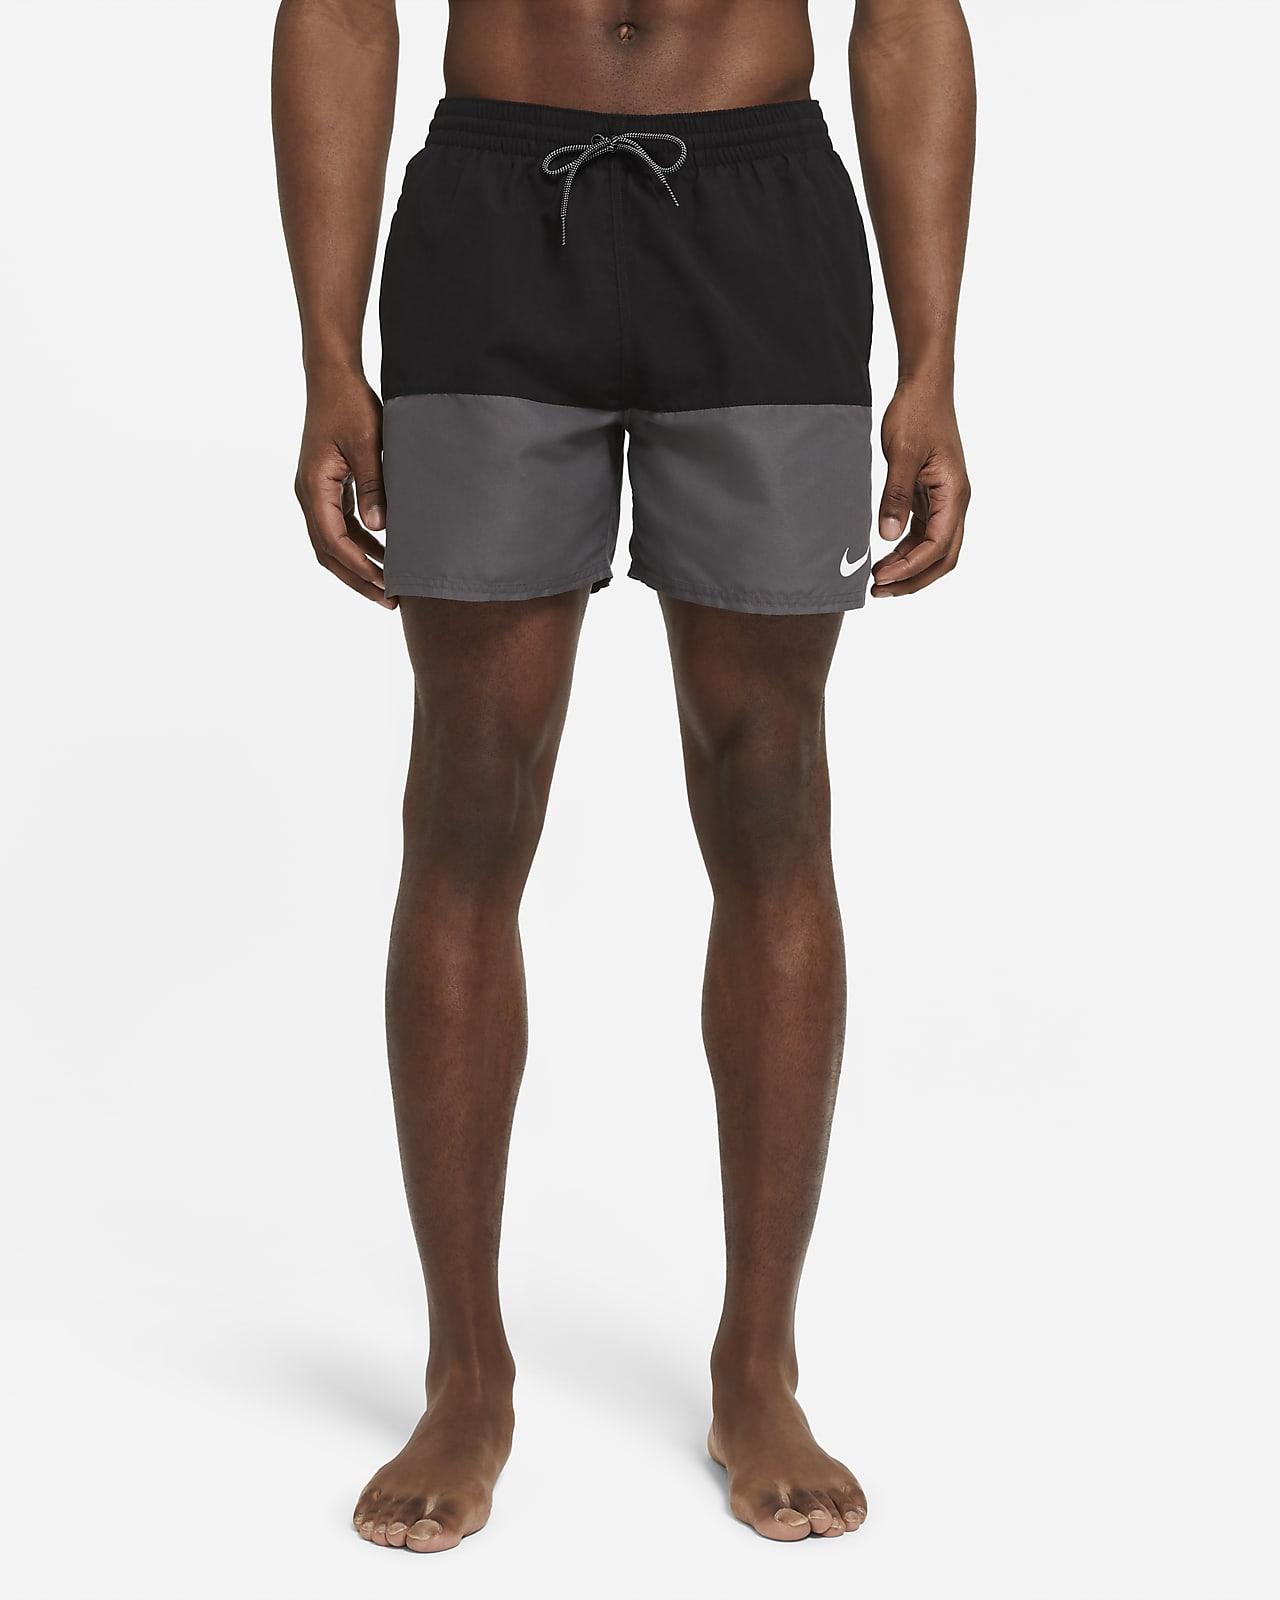 Badshorts Nike Split 13 cm för män